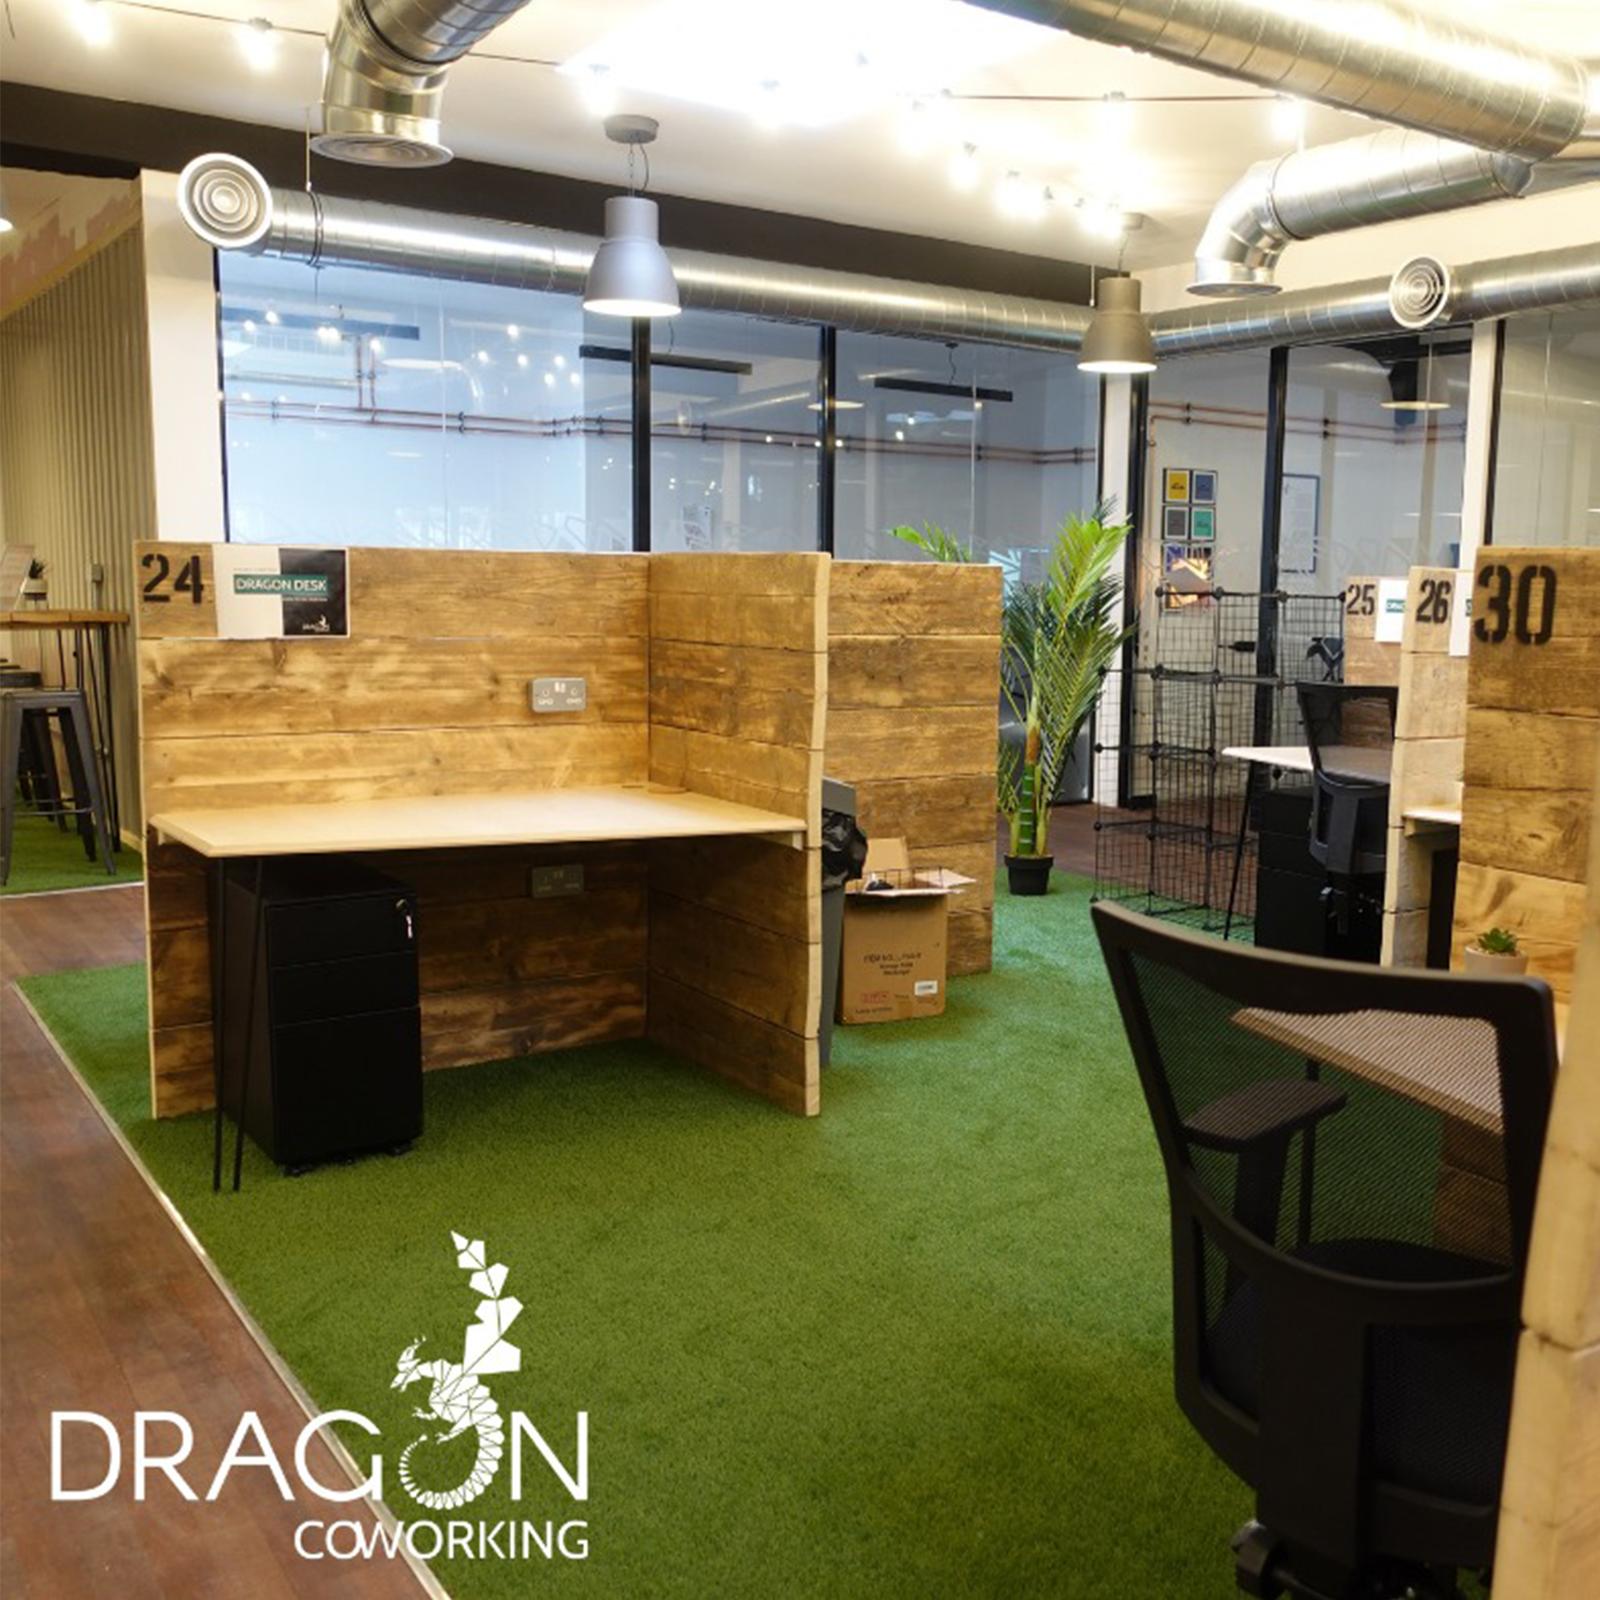 Dragon Coworking